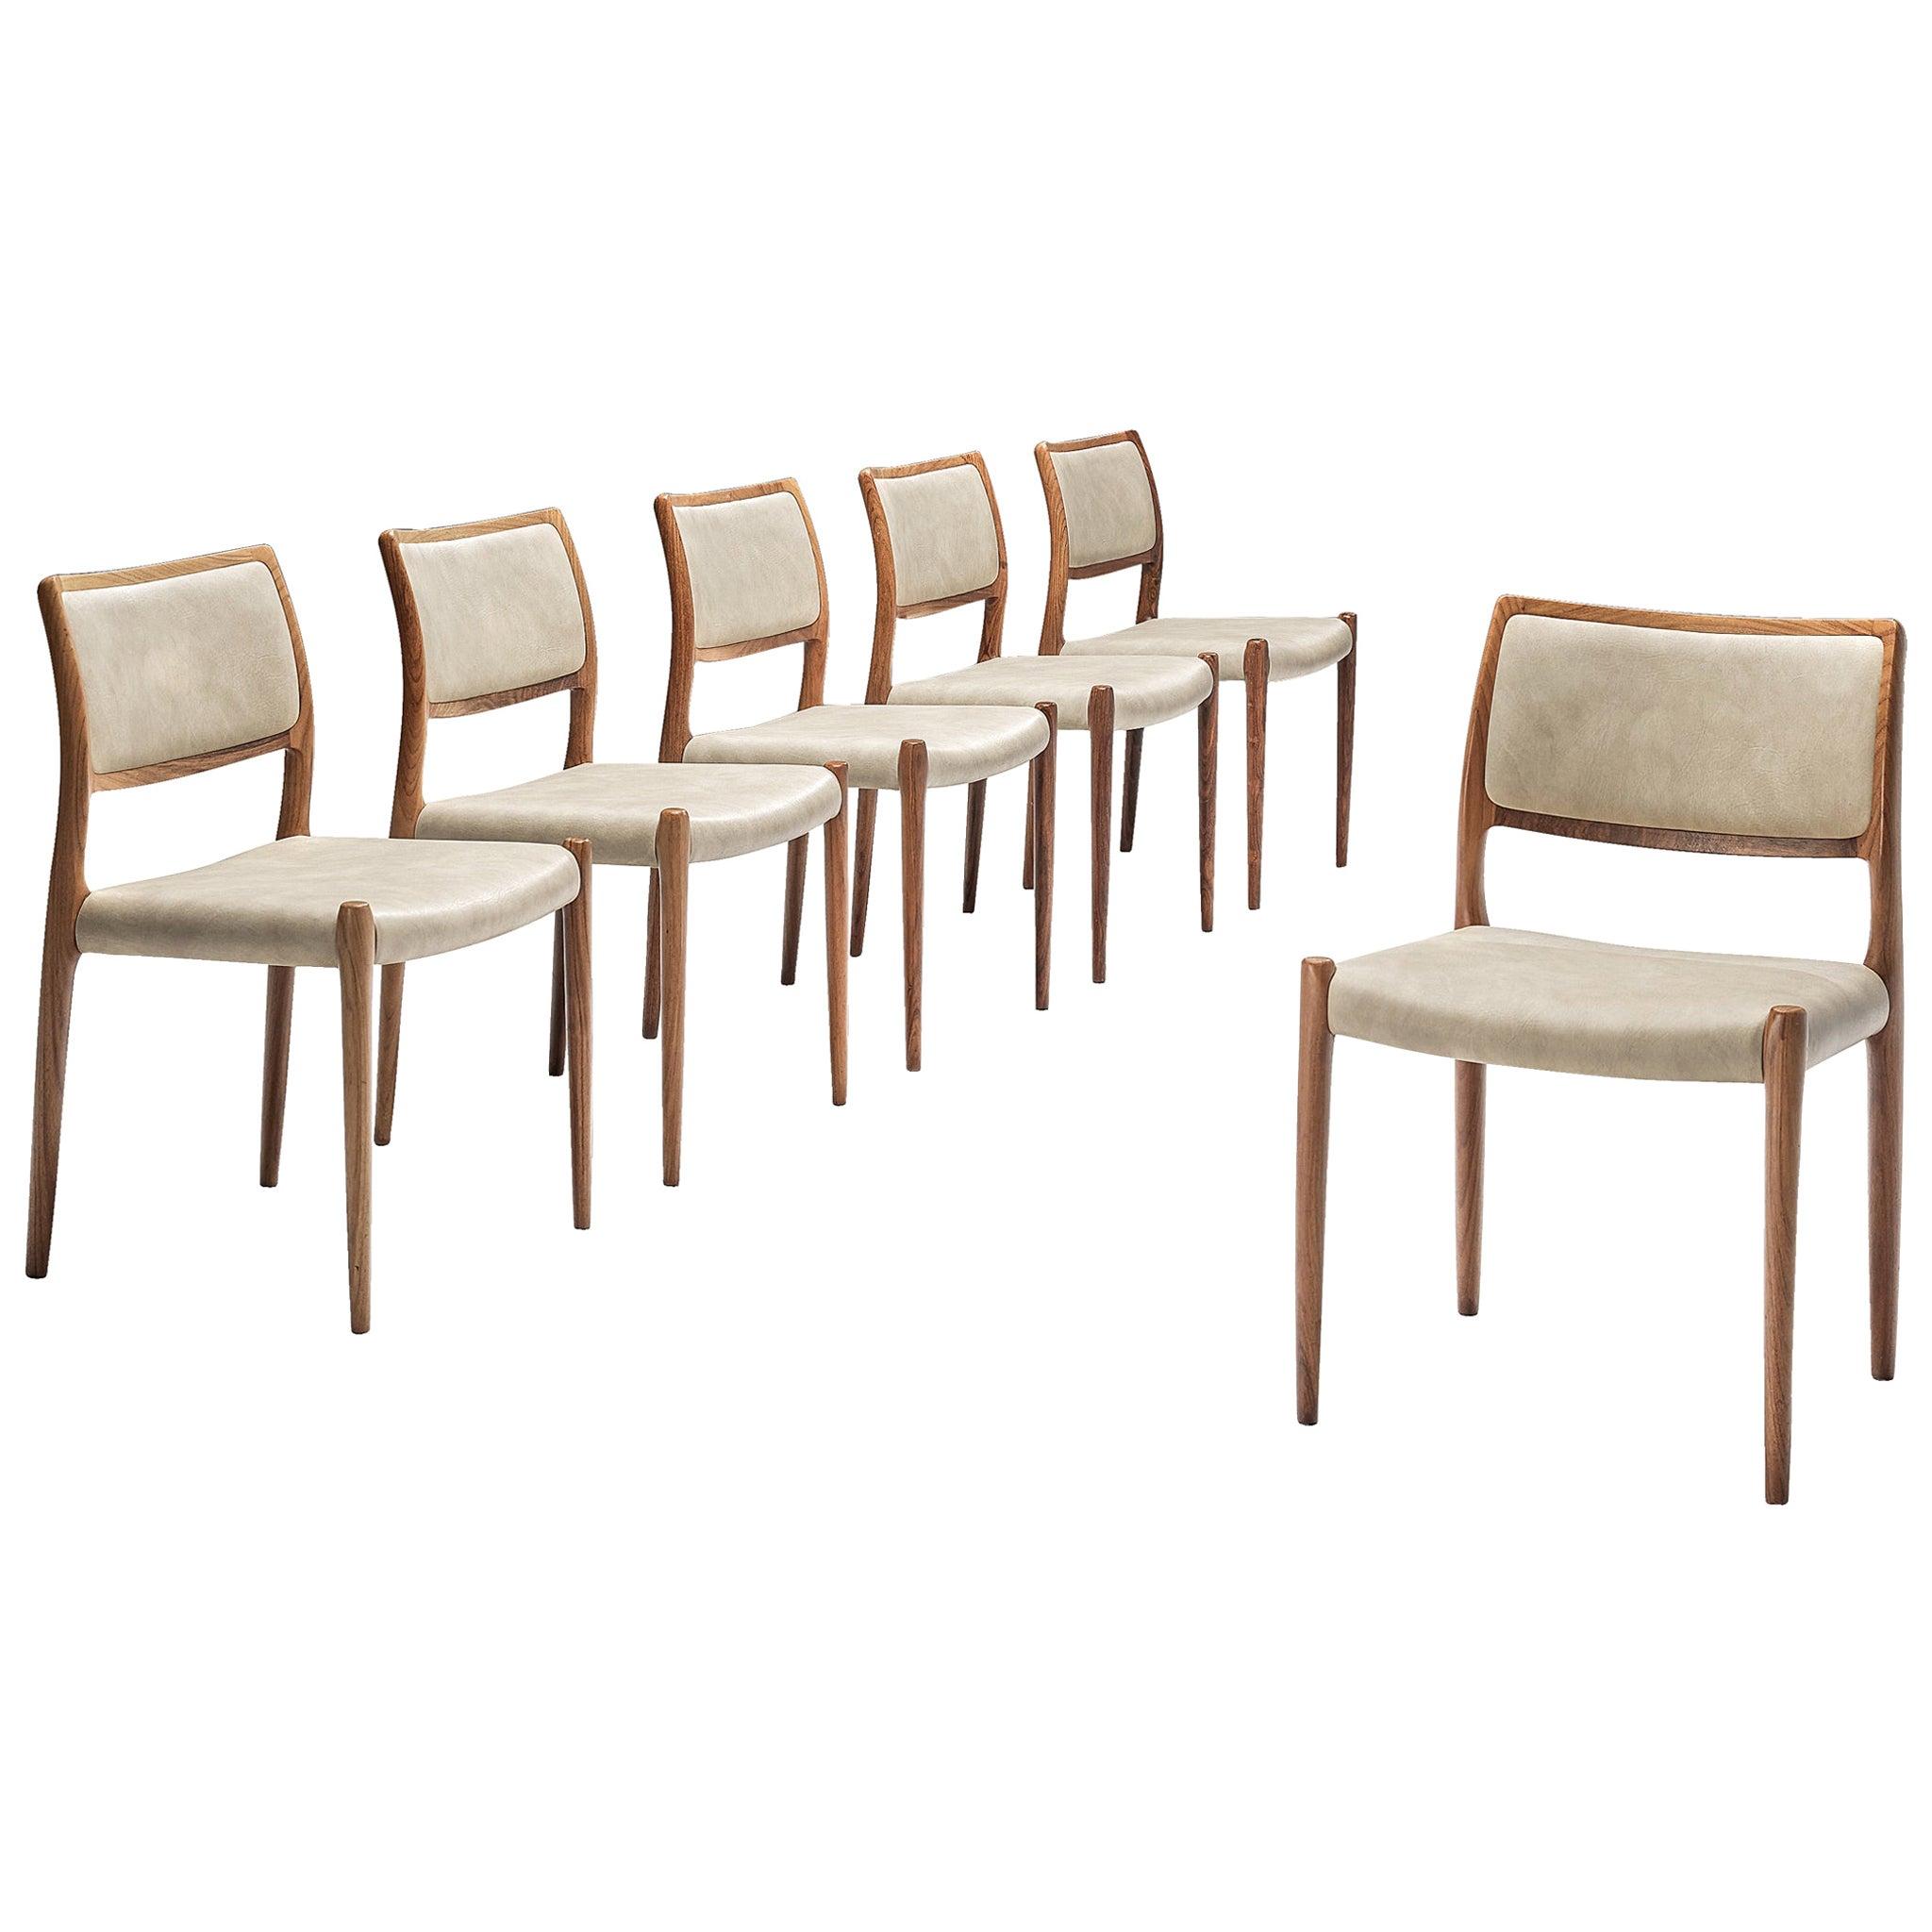 Niels OttoMøller Set of Six Dining Chairs Model 80 in Teak